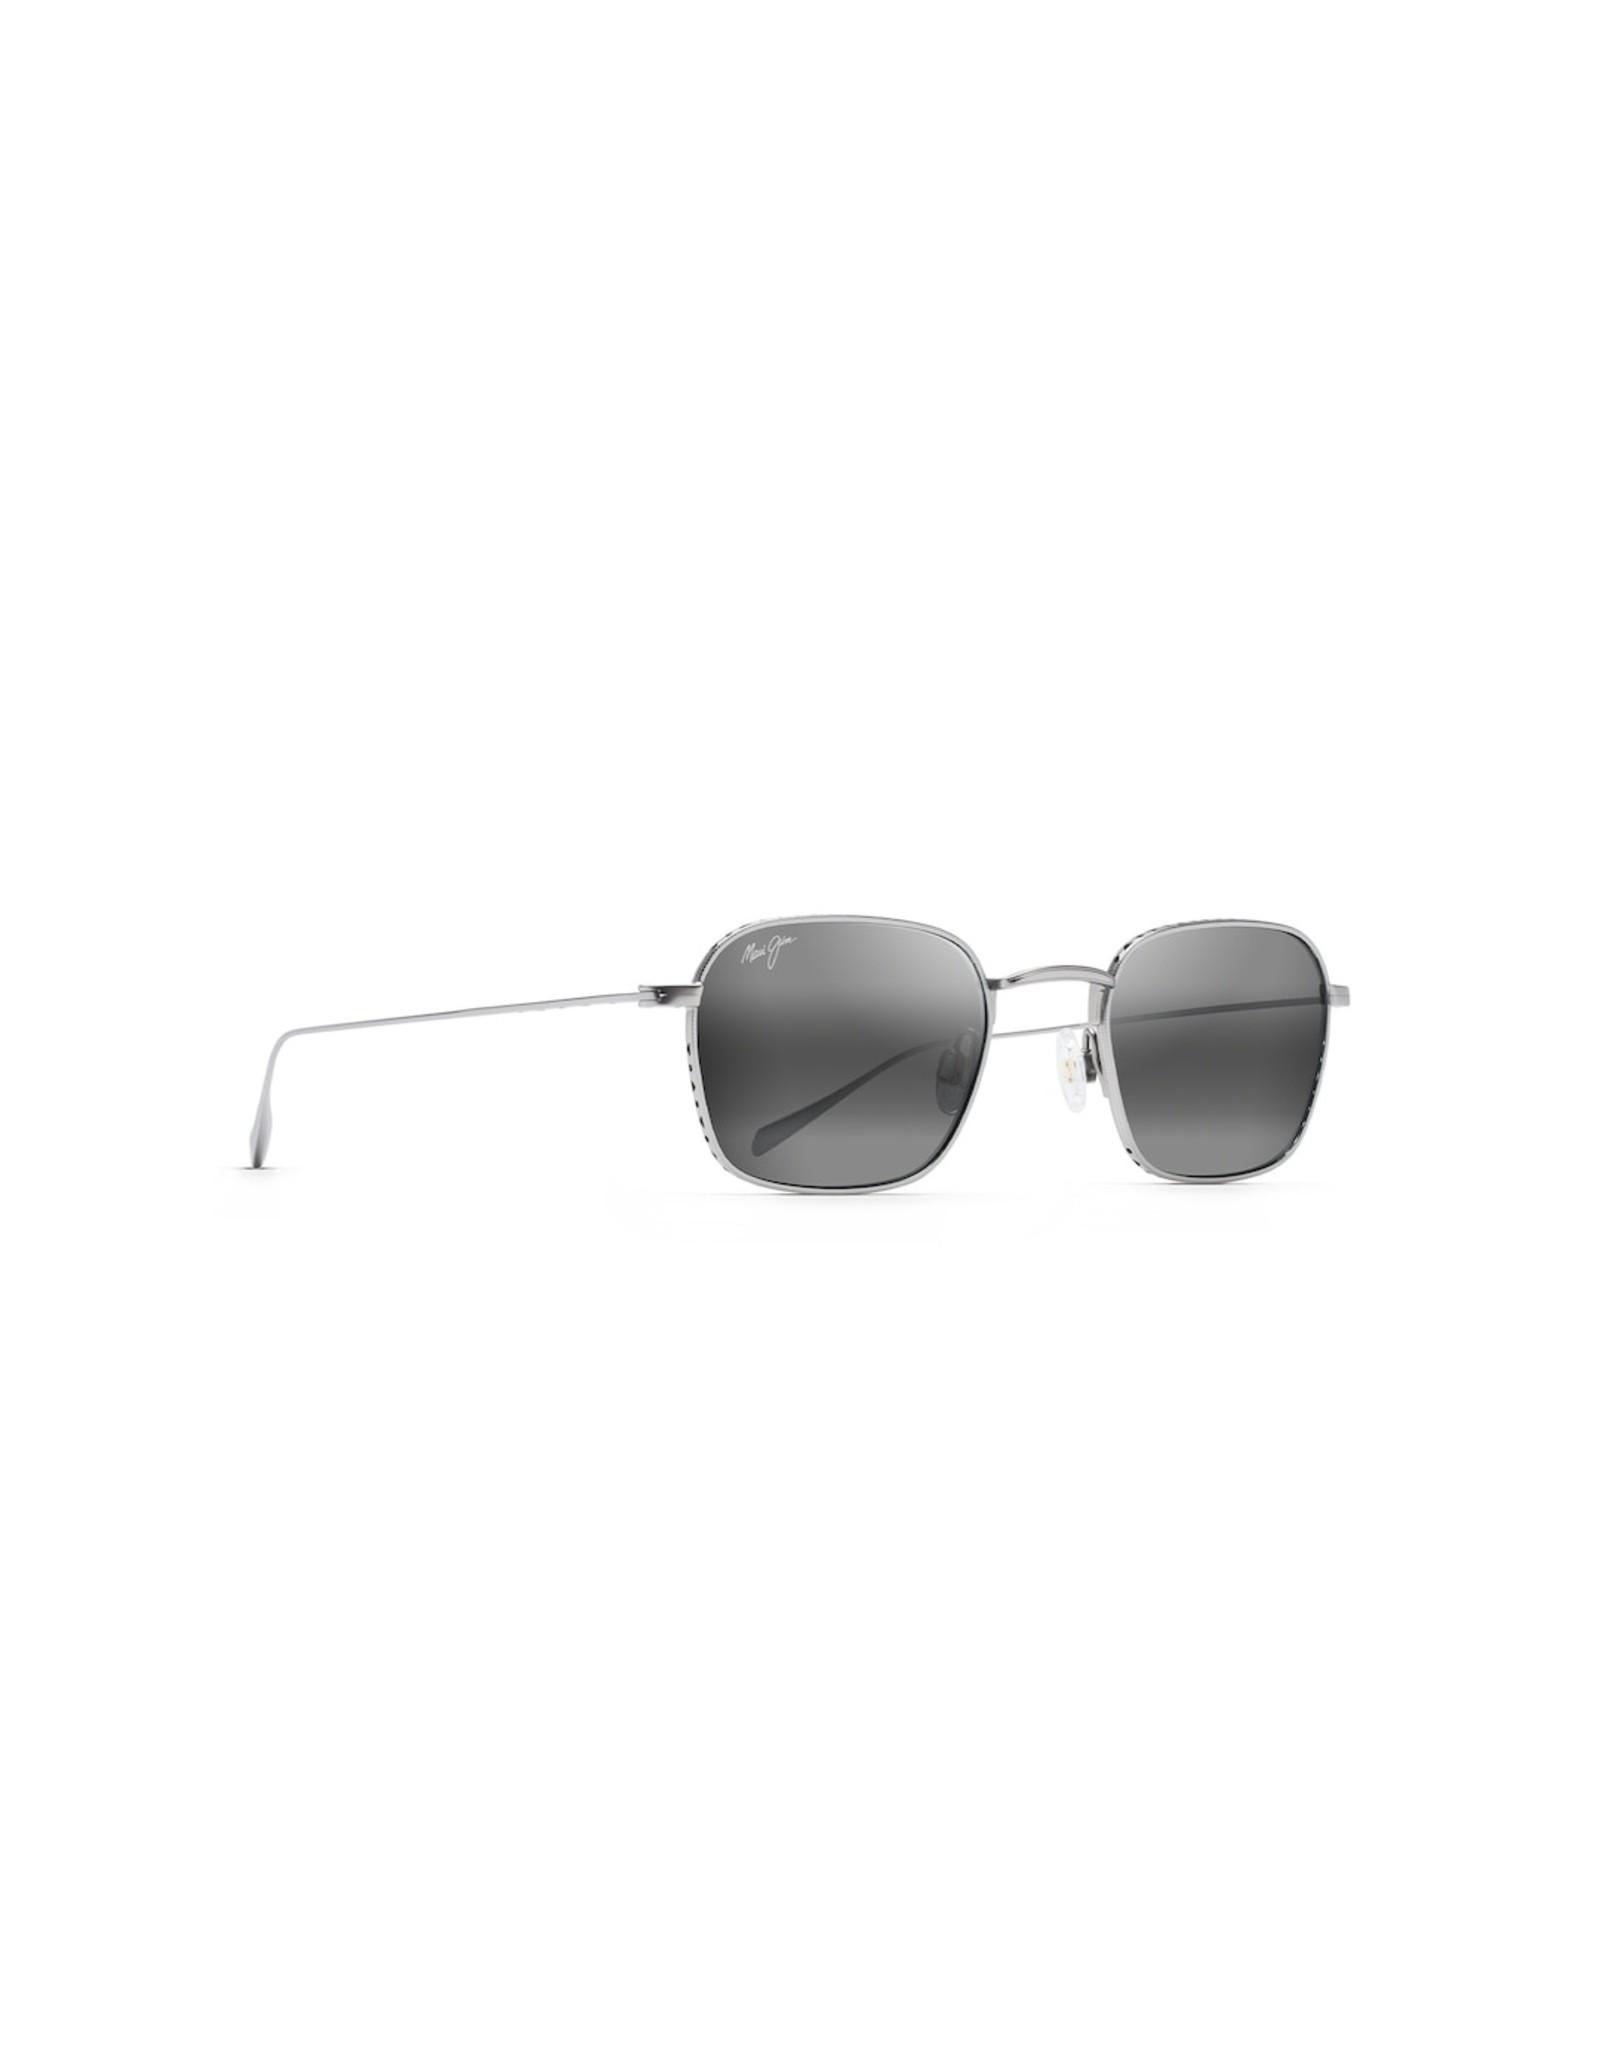 Maui Jim Maui Jim 'PUKA' Sunglasses